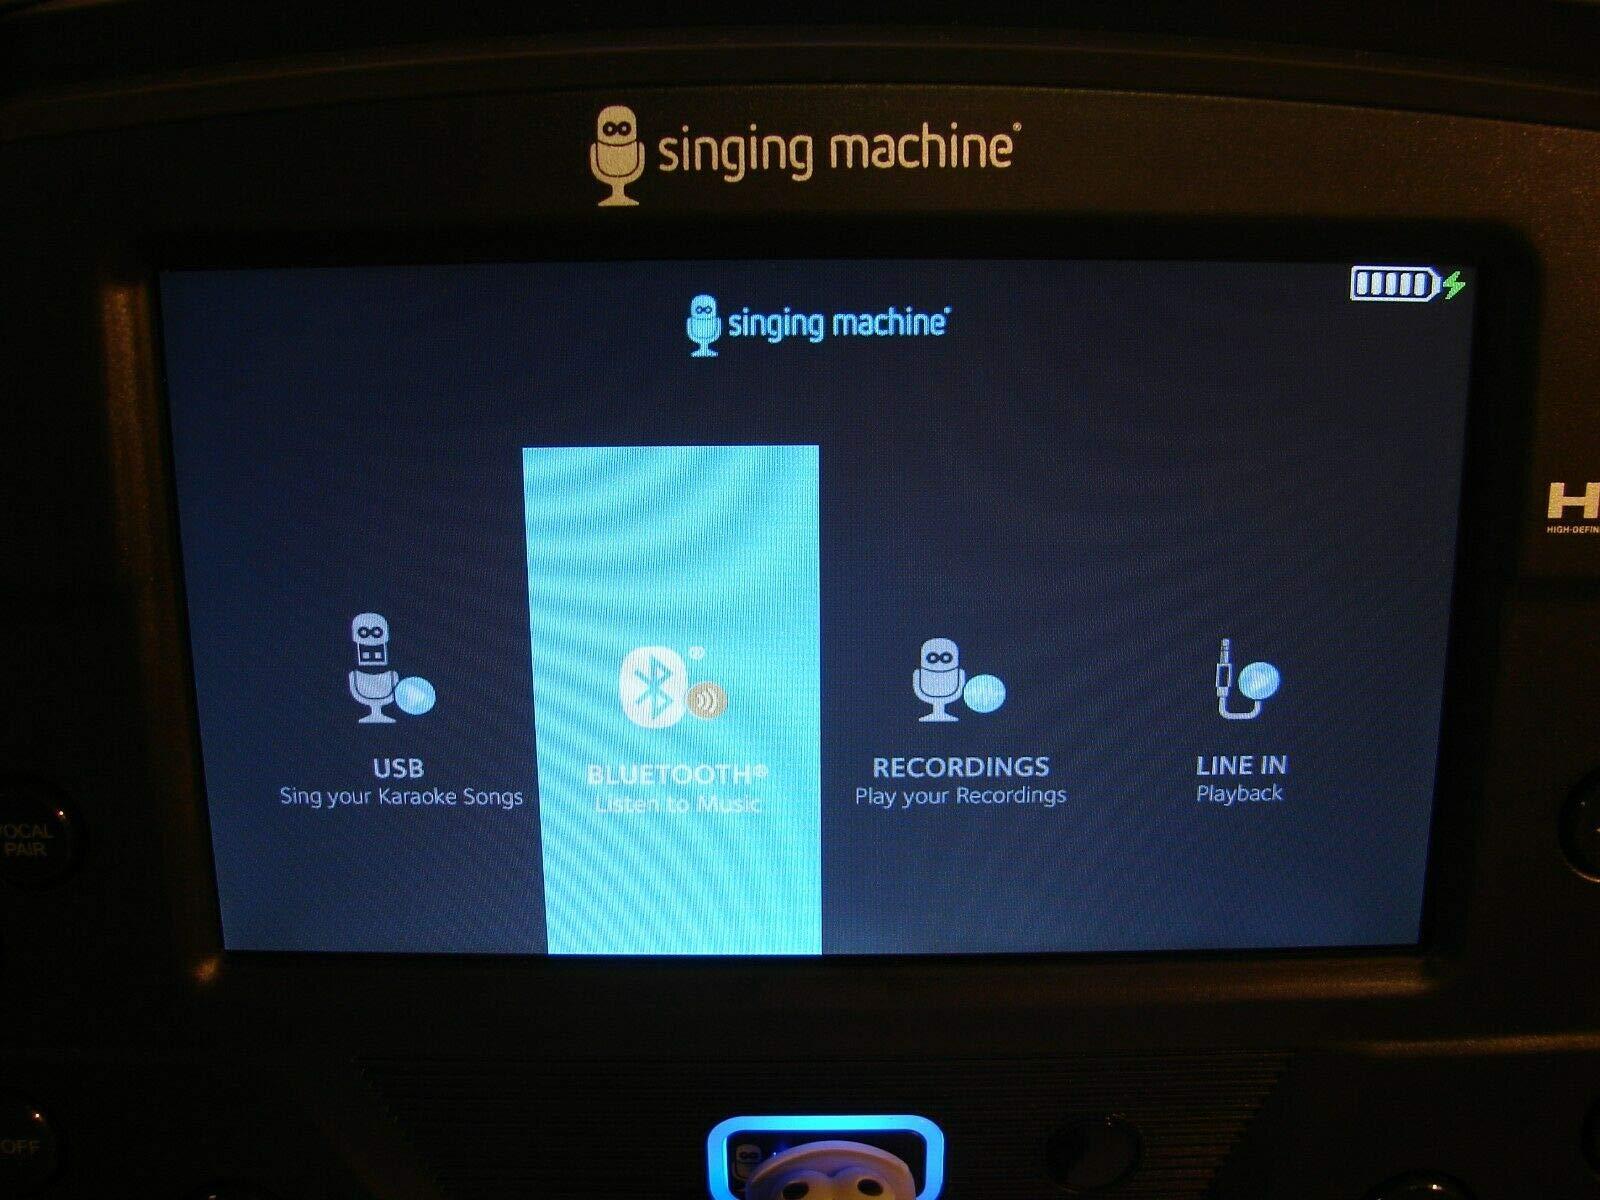 Amoldar 5inging Machine Fiest@ Voice Hi-Definition Karaoke System SDL9040 by Amoldar (Image #3)